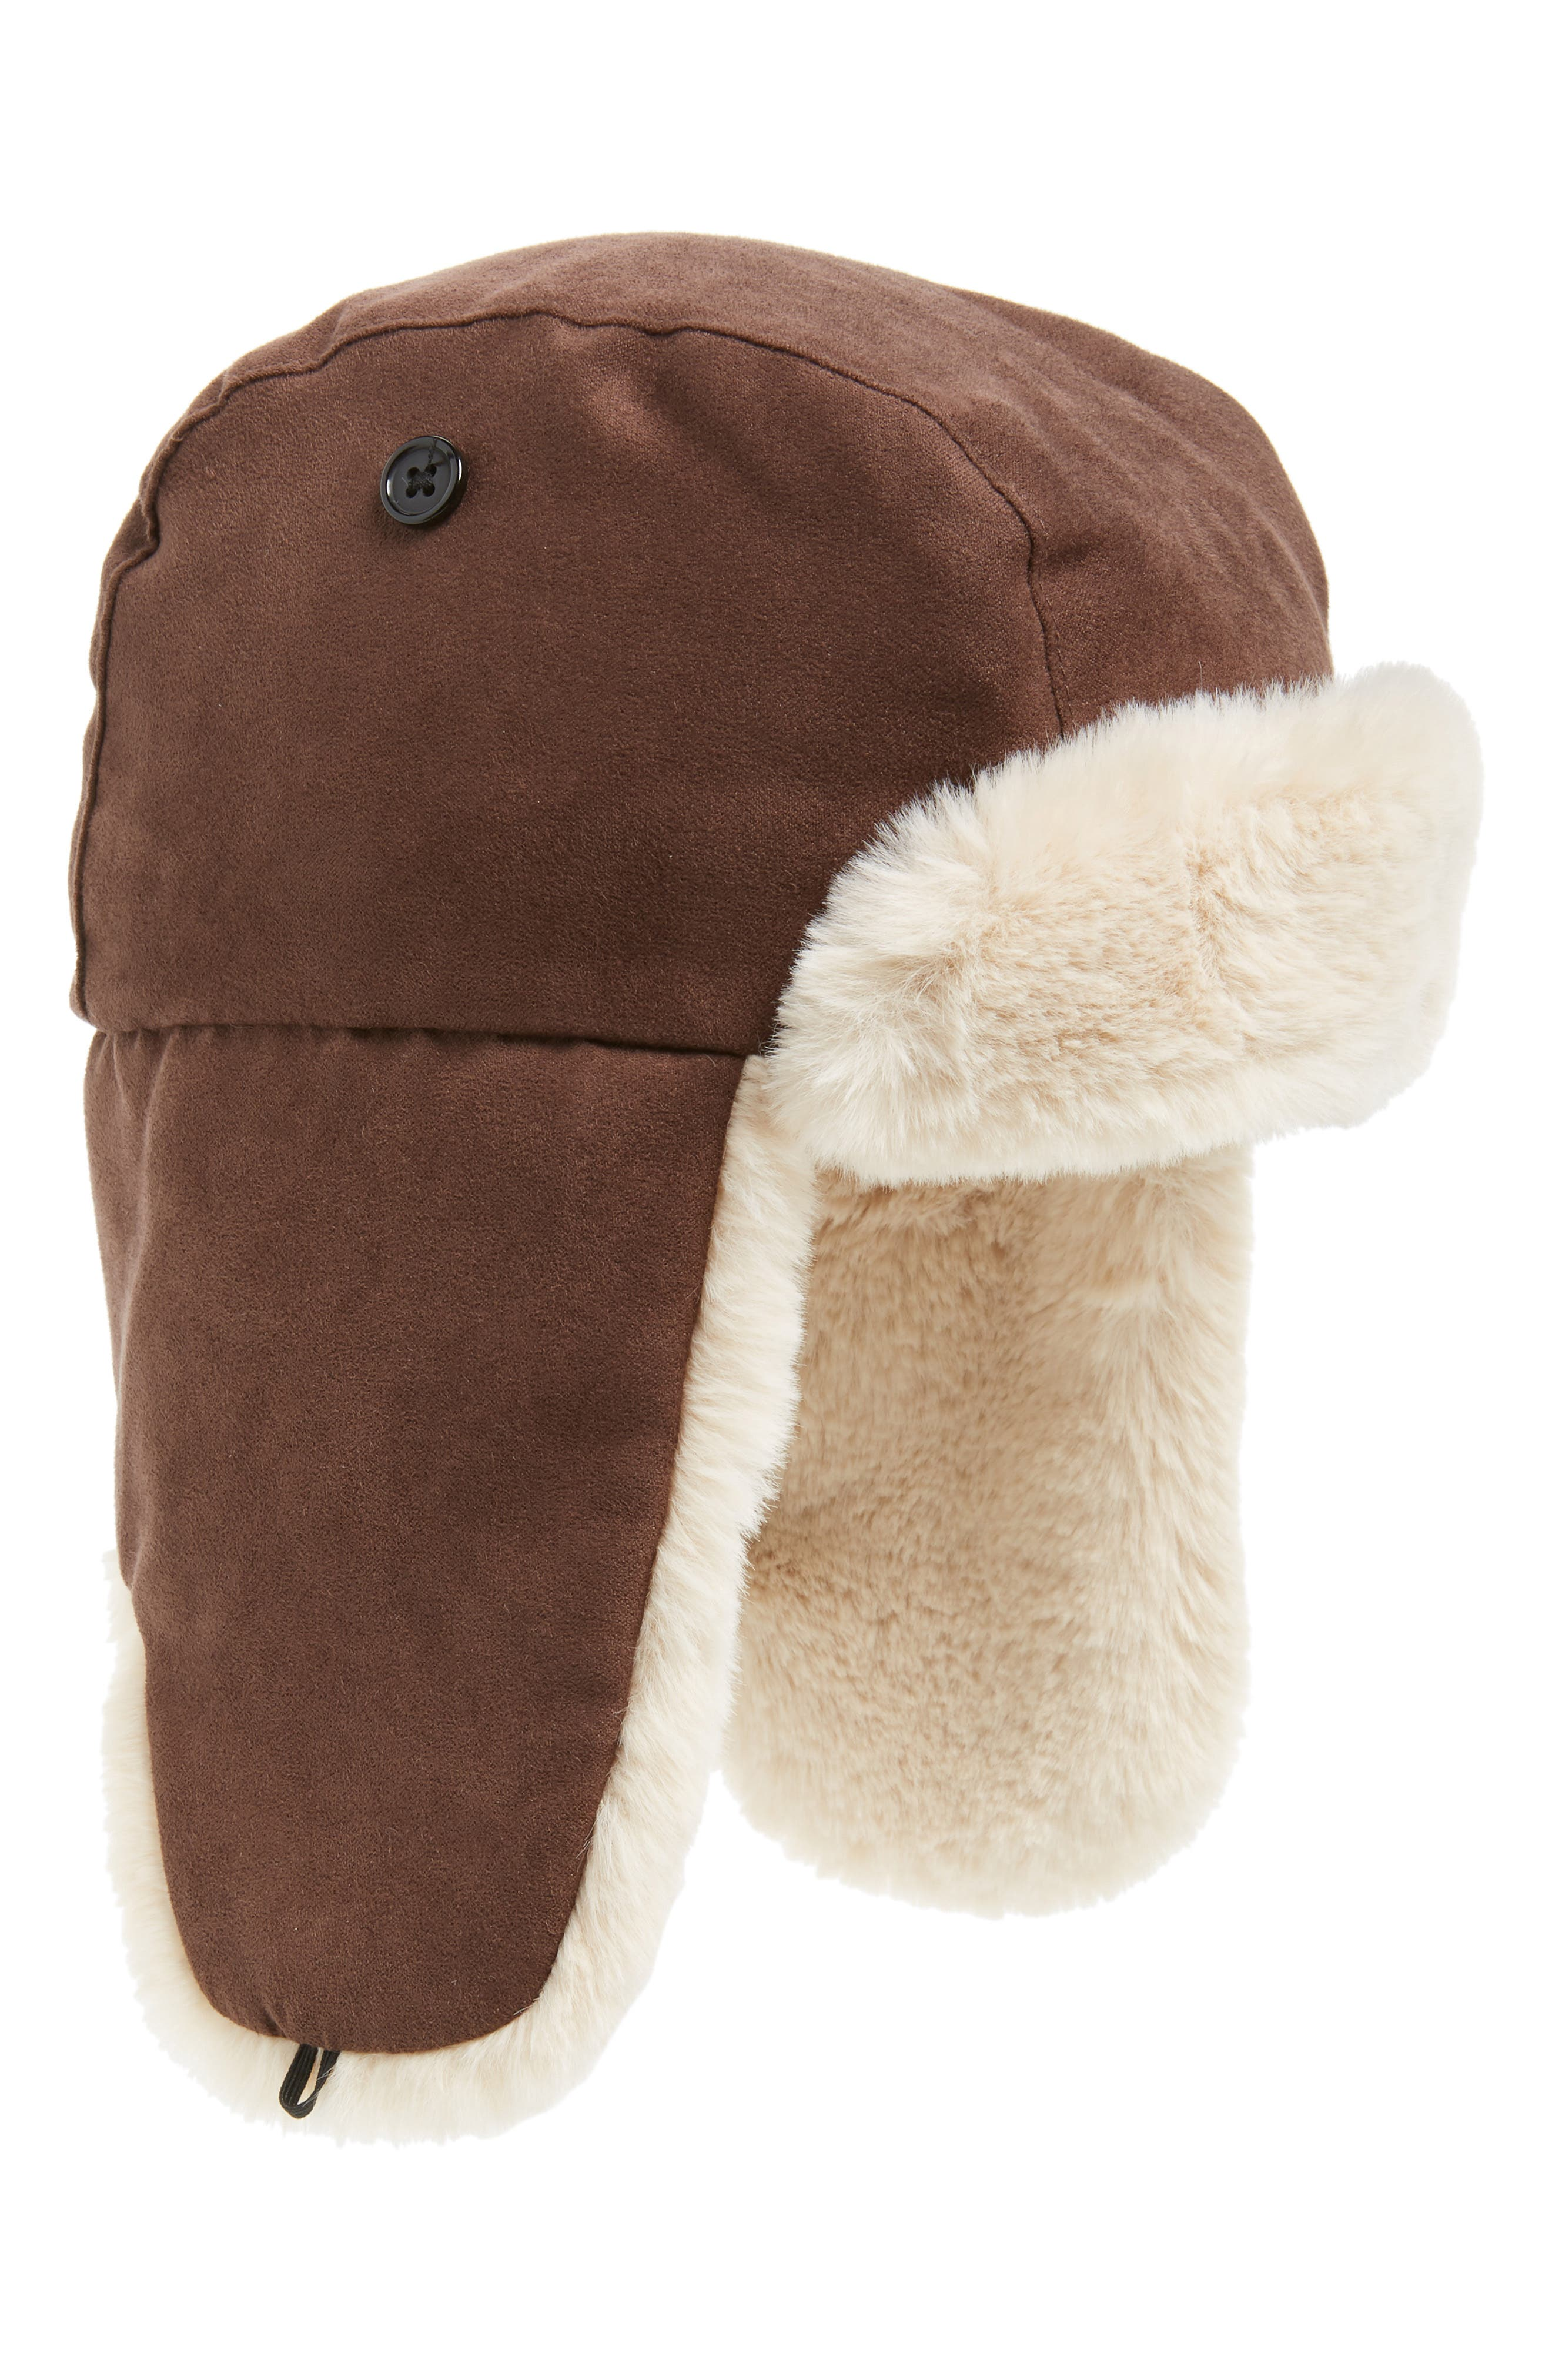 Boys Crewcuts By Jcrew Faux Fur Lined Trapper Hat